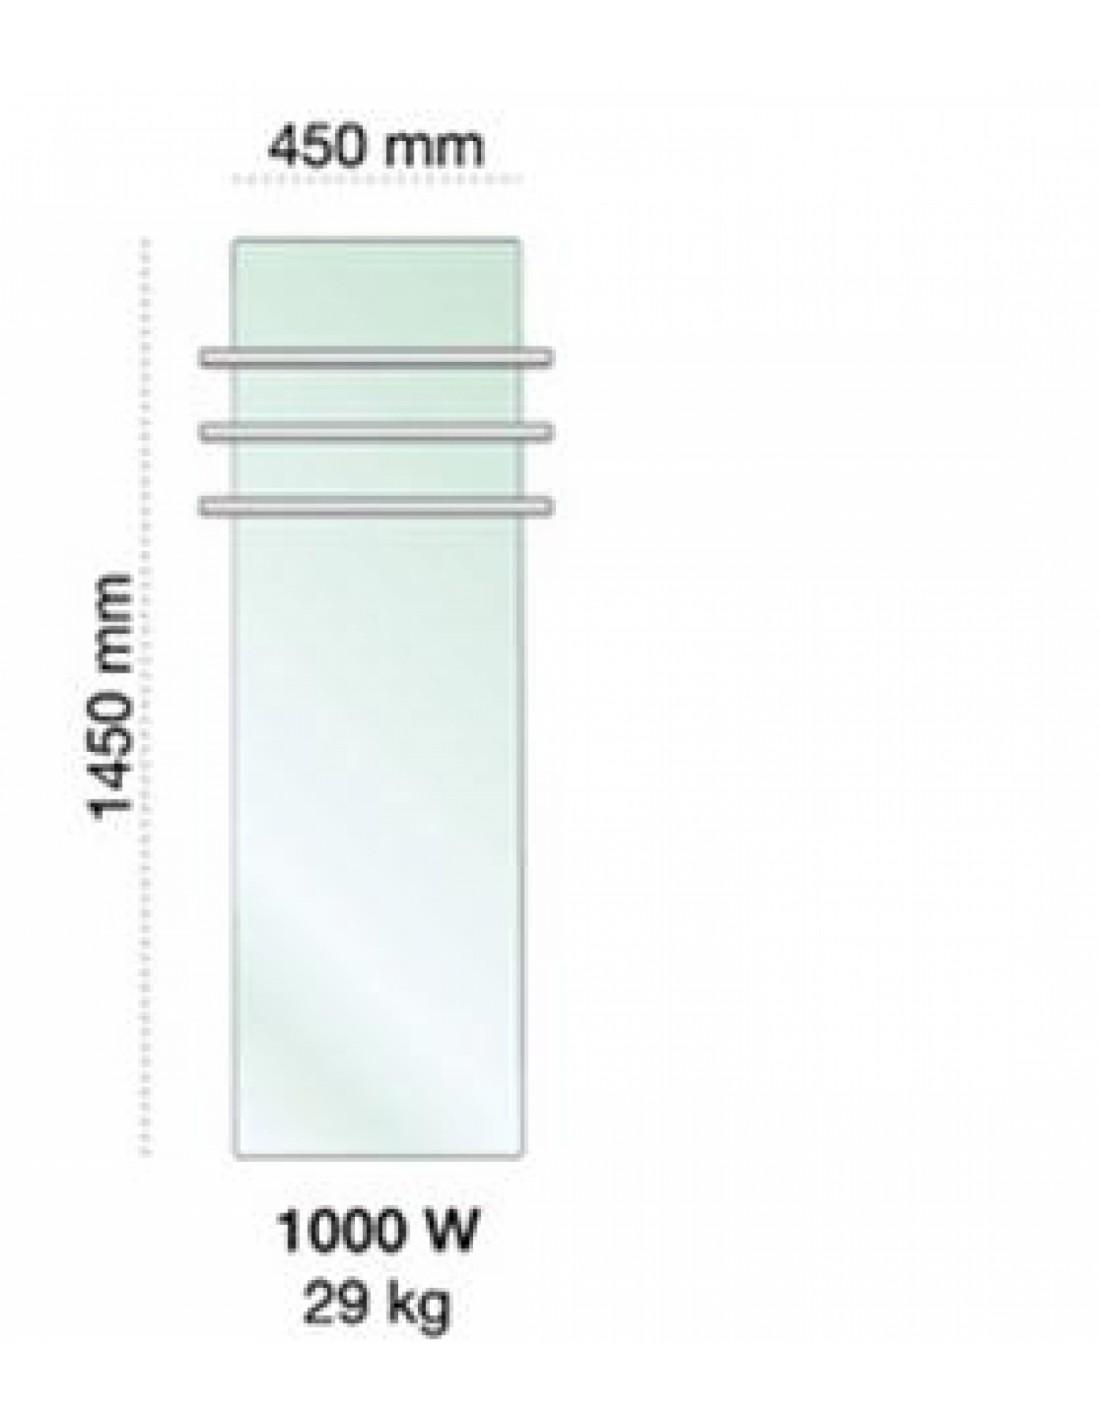 s che serviettes solaris 45 1000w. Black Bedroom Furniture Sets. Home Design Ideas